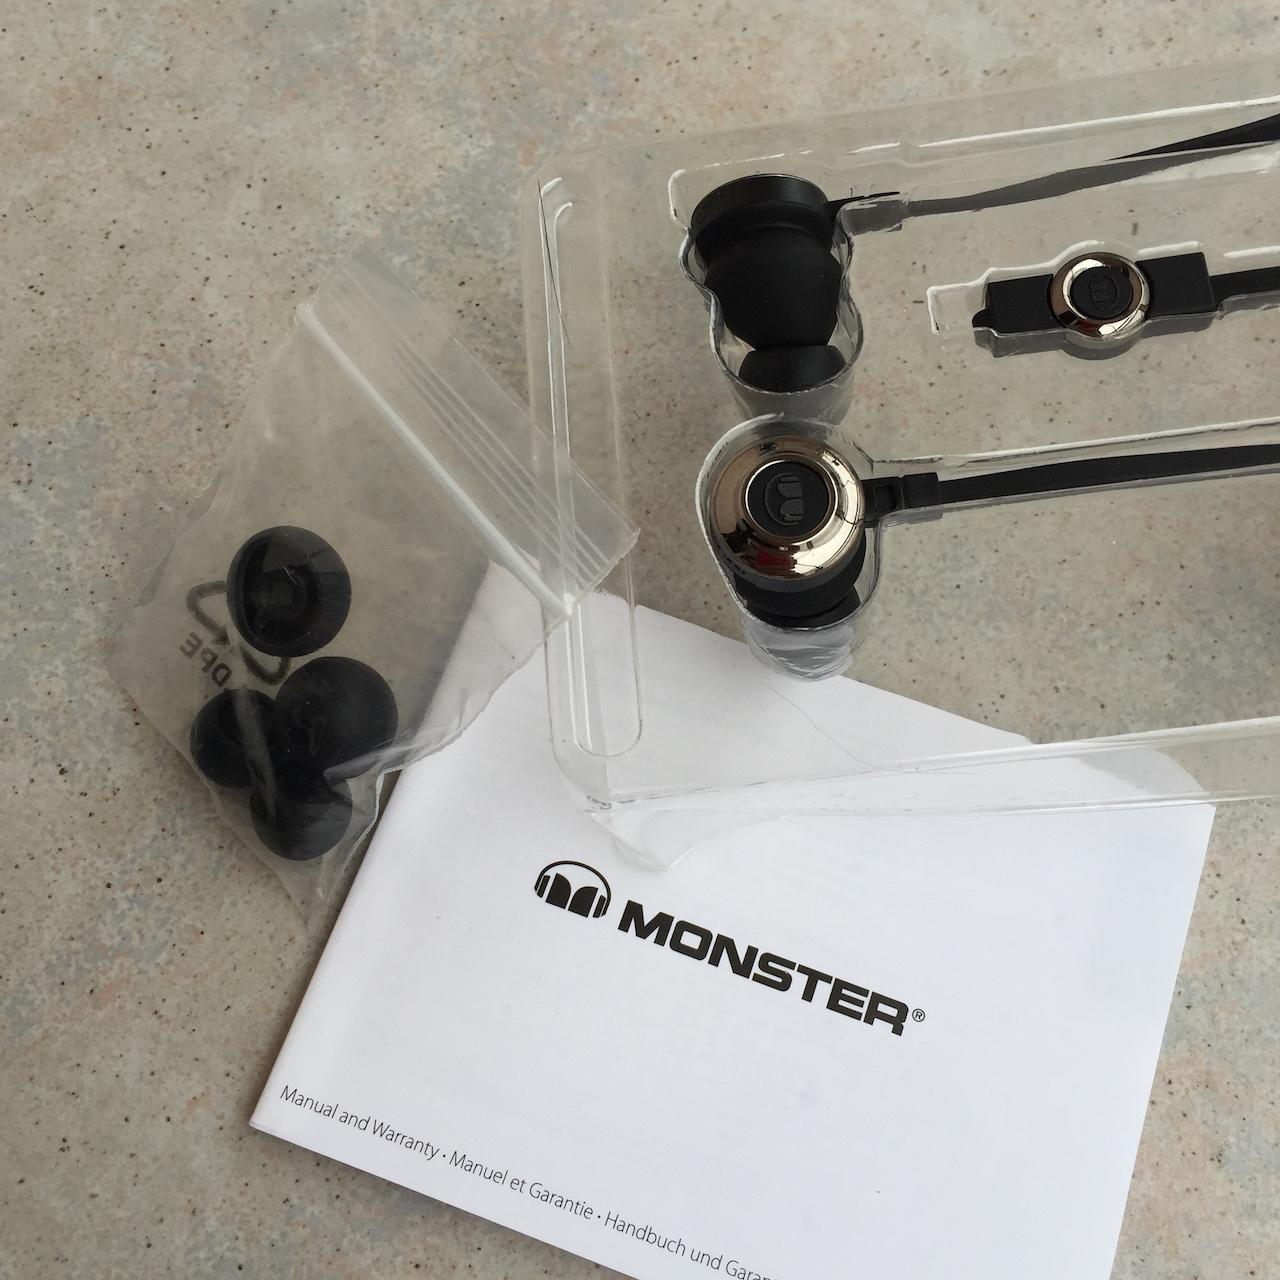 Monster ClarityHD In-Ear - Lieferumfang